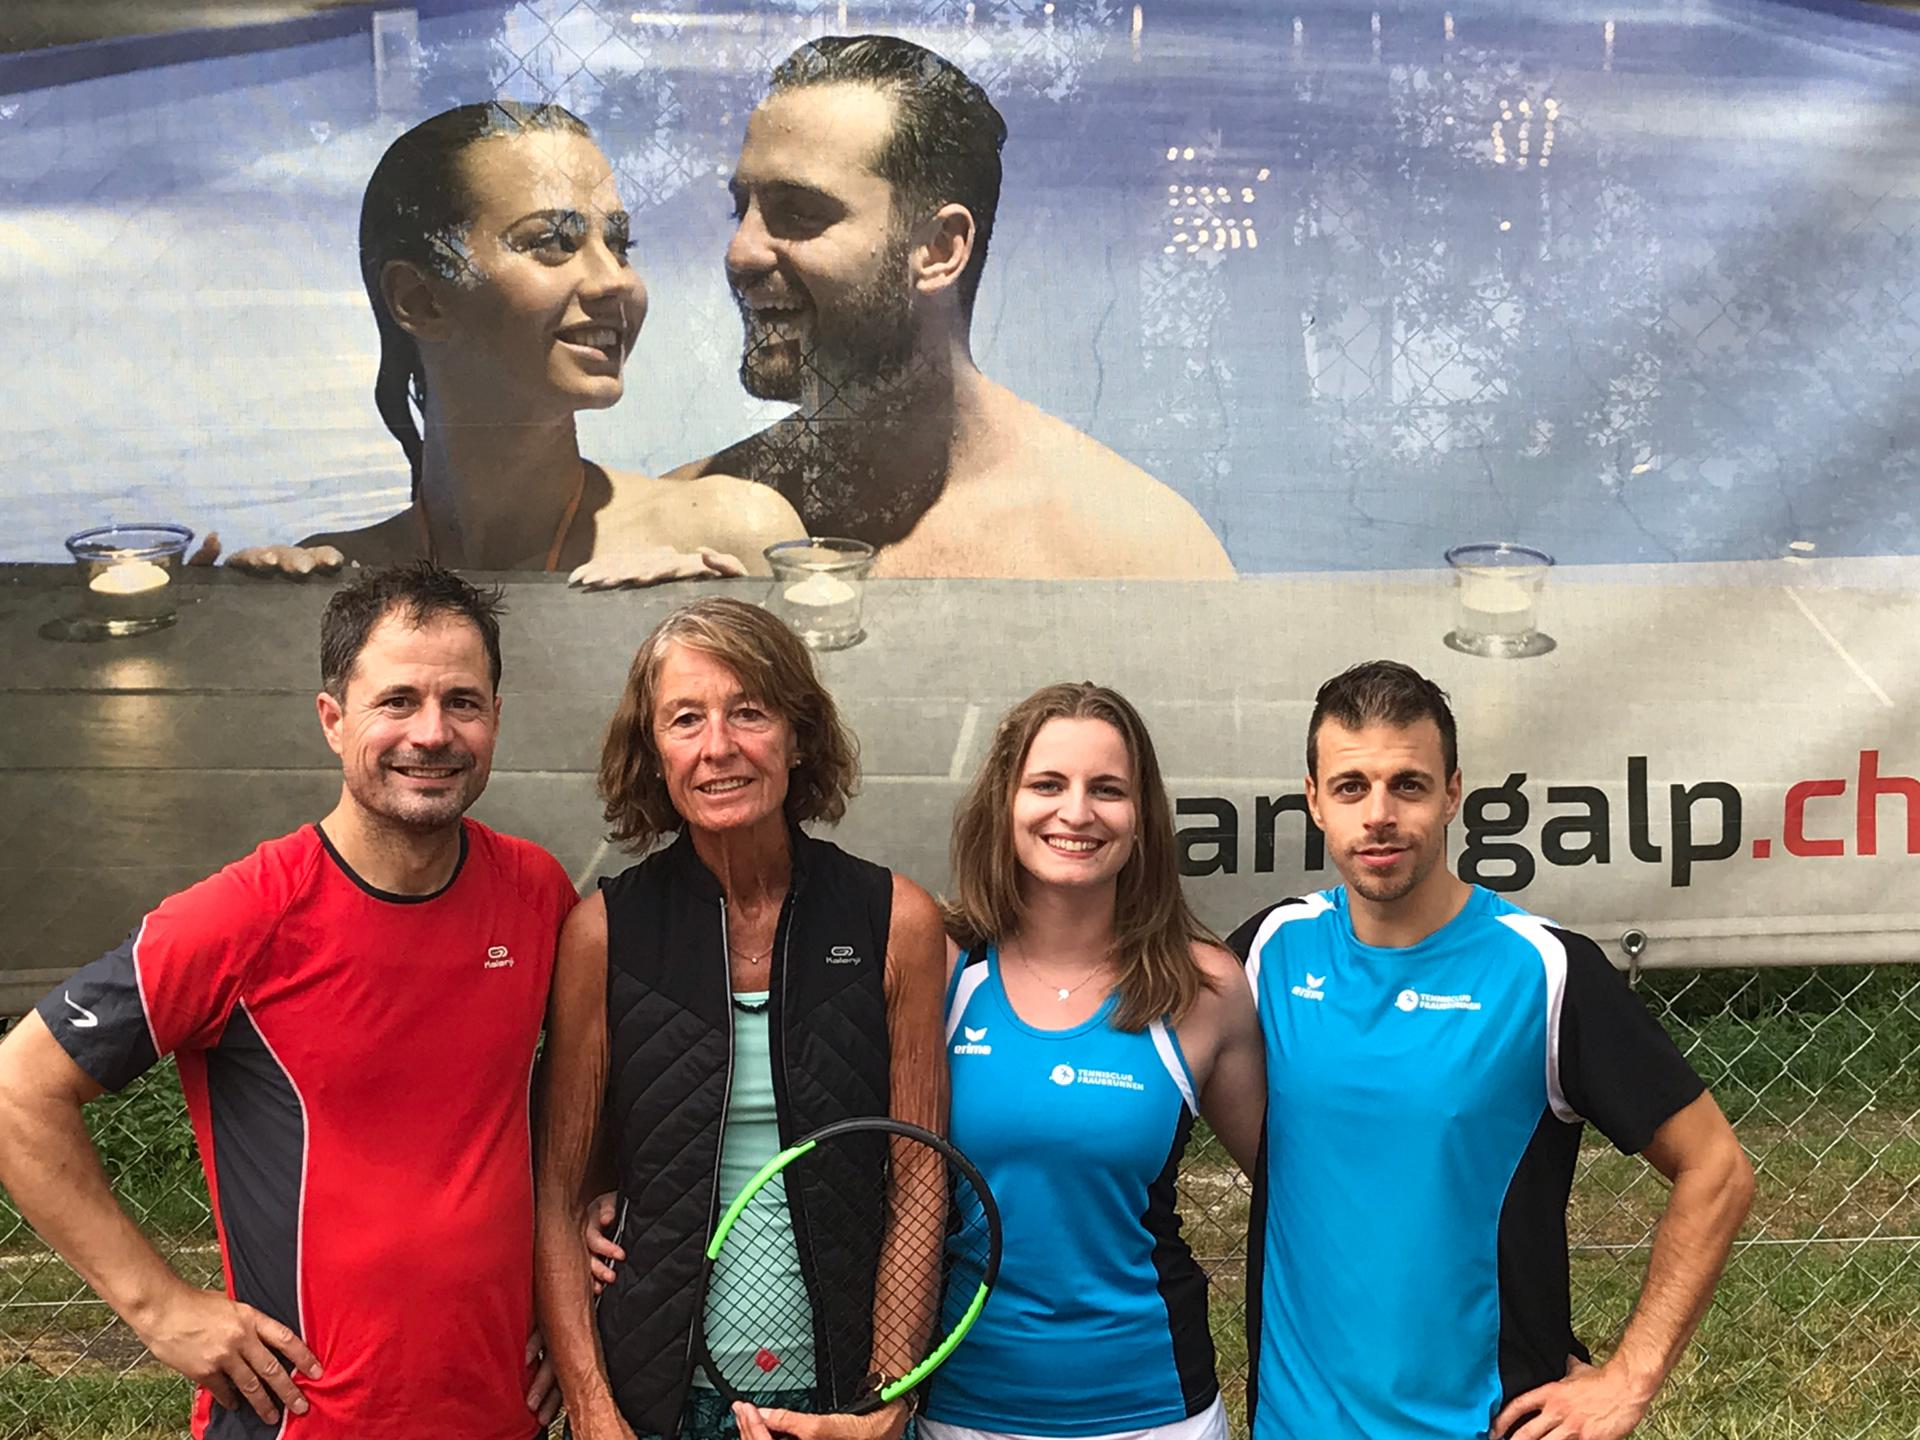 2019 Mixed Doppel Sieger: F. Aeberhard & M. Schläfli / Finalist: Ch. Fricker & E. Fricker